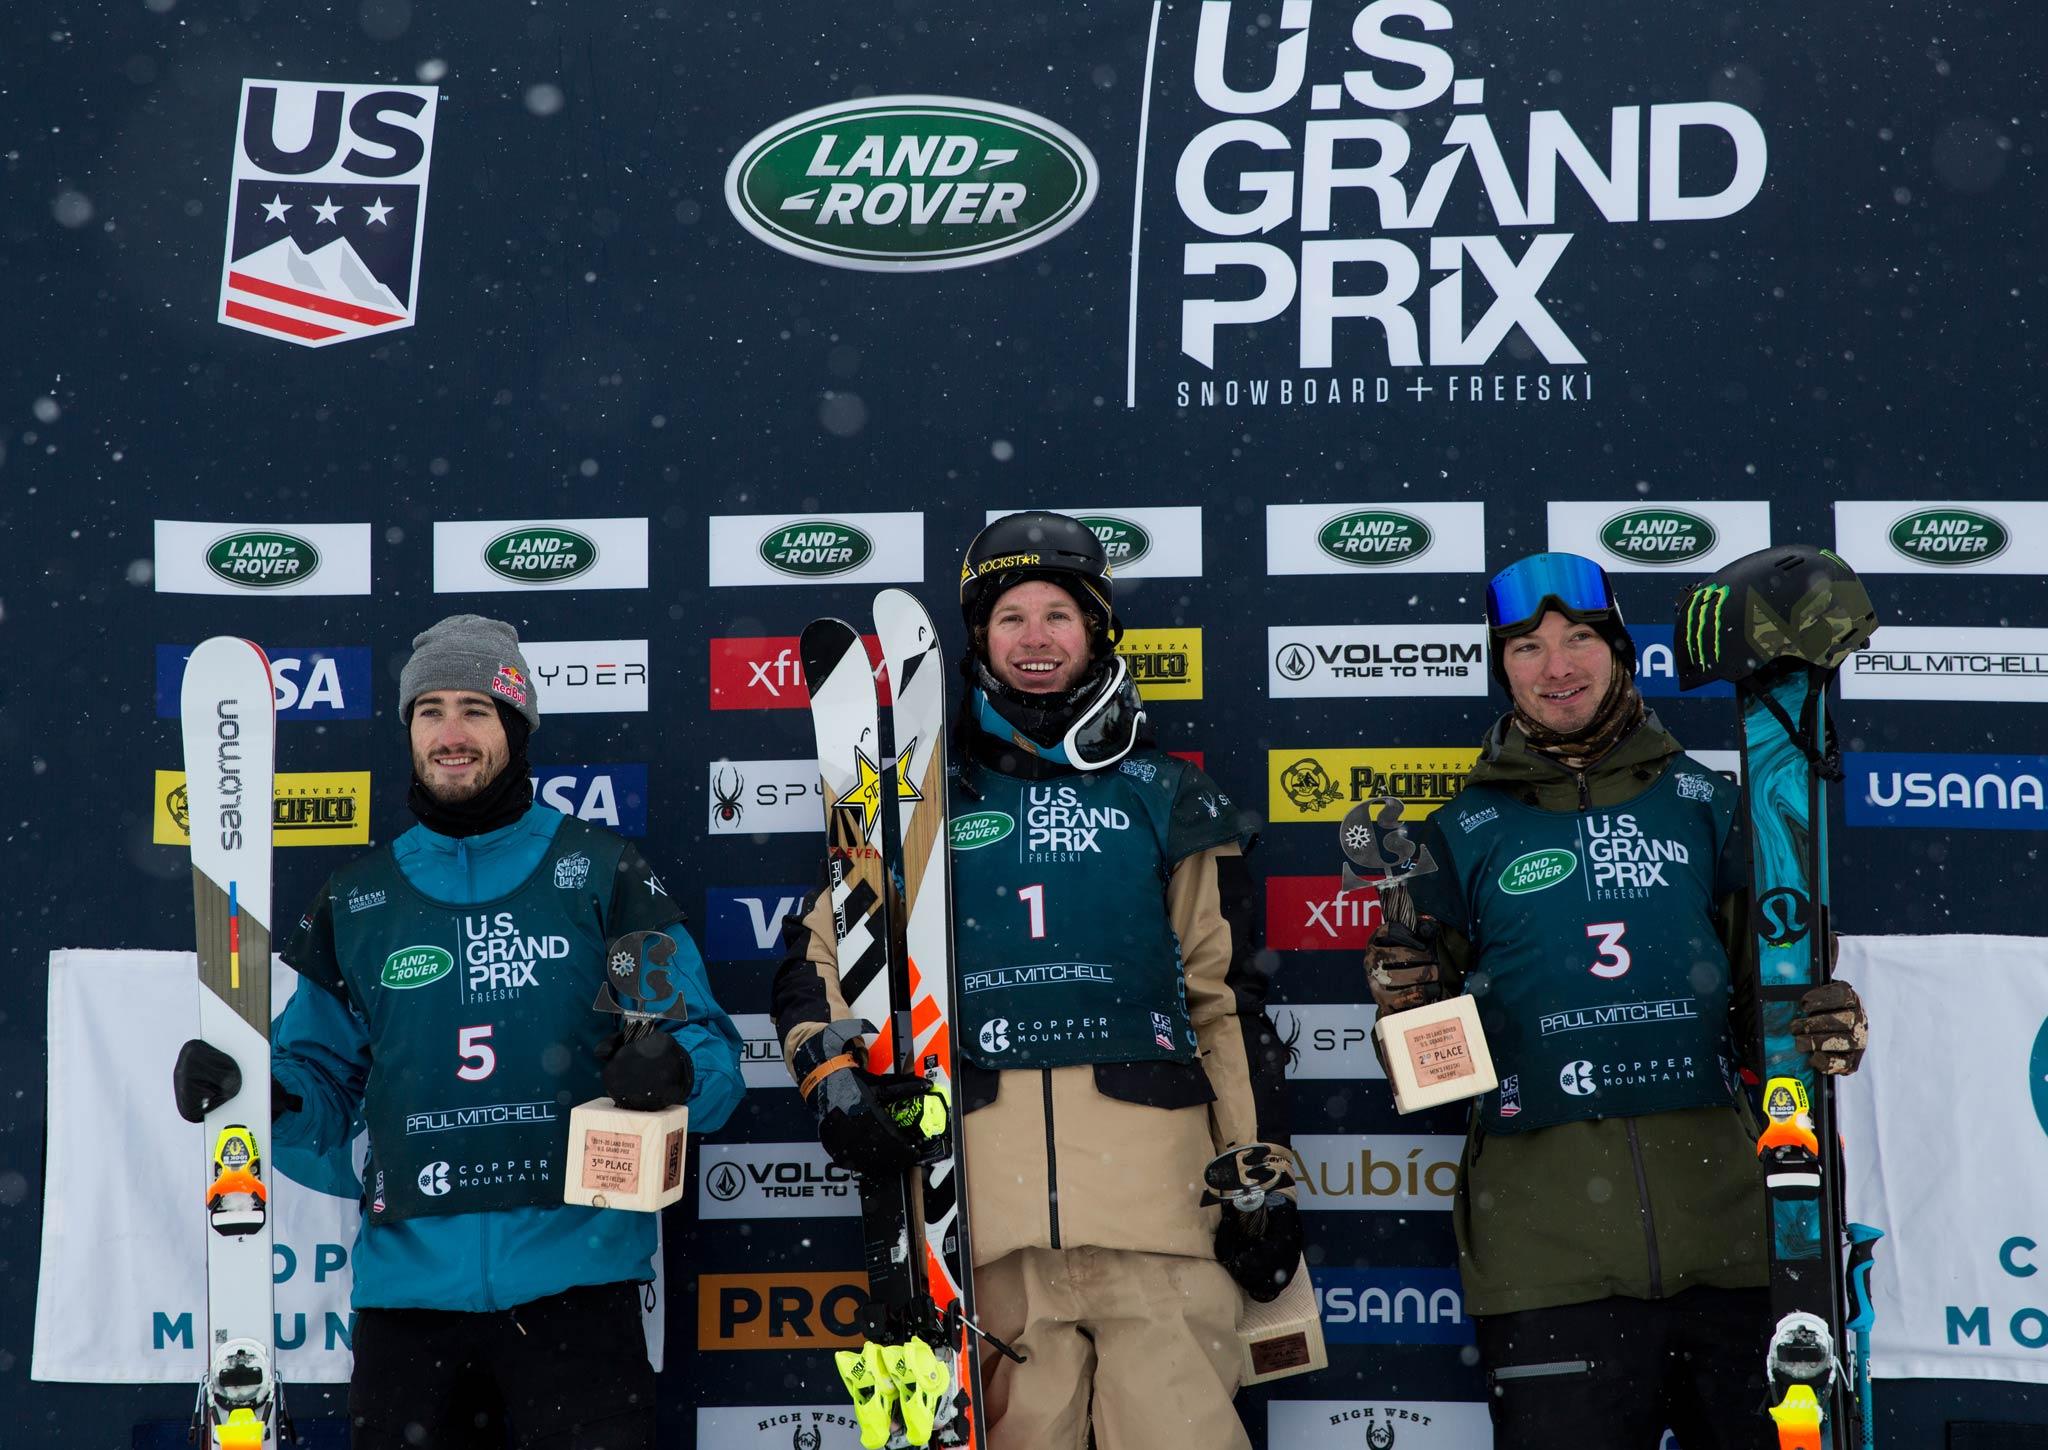 Das Podium der Männer: Noah Bowman (CAN), Aaron Blunck (USA), David Wise (USA). - Foto: FIS Freestyle